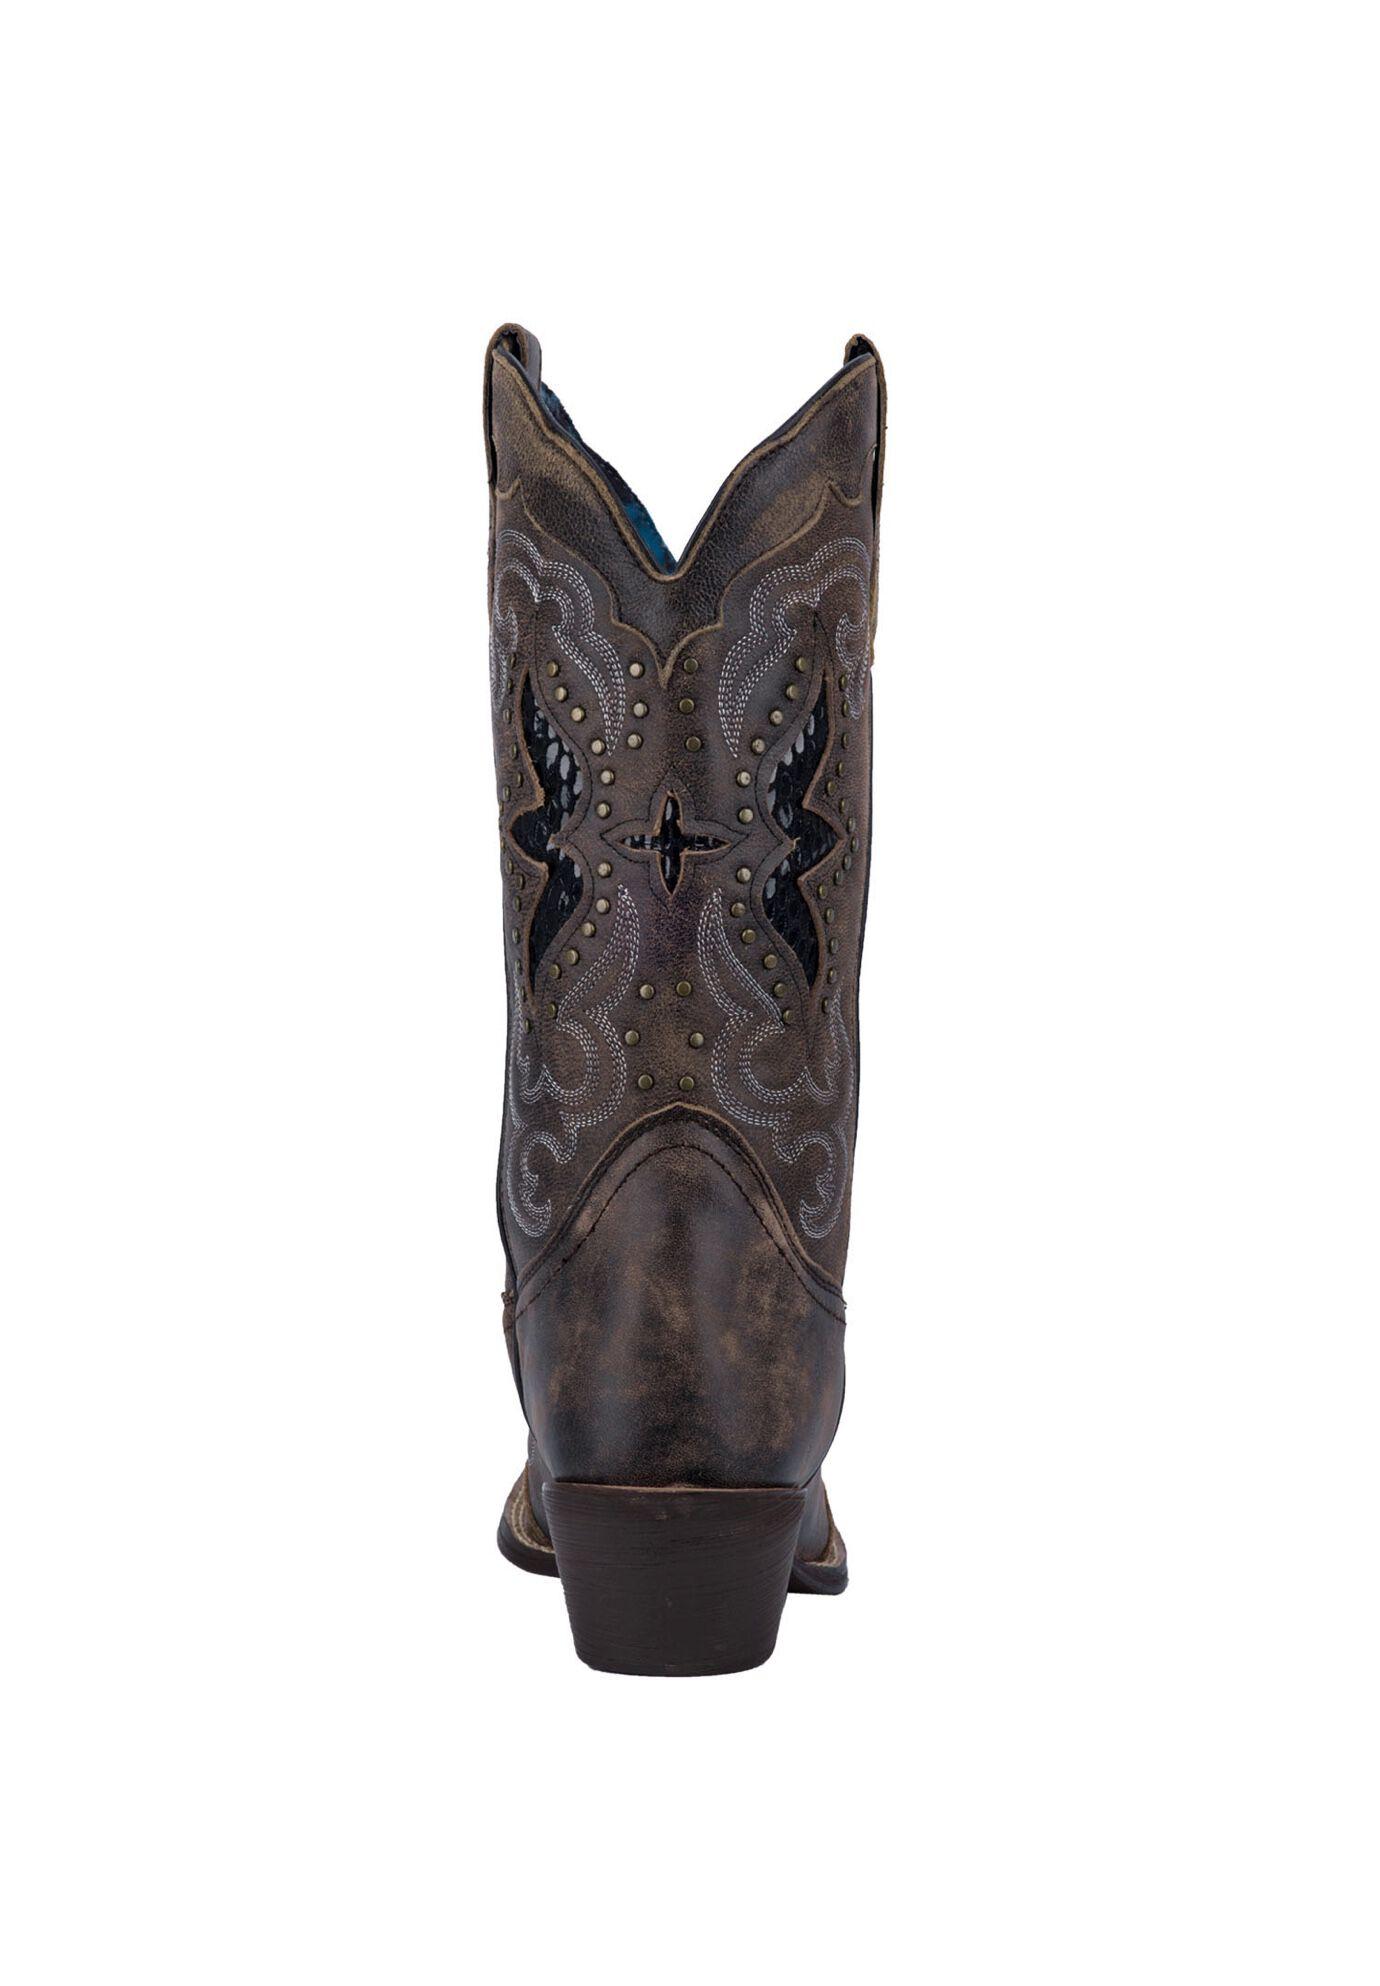 Lucretia Wide Calf Boots by Laredo